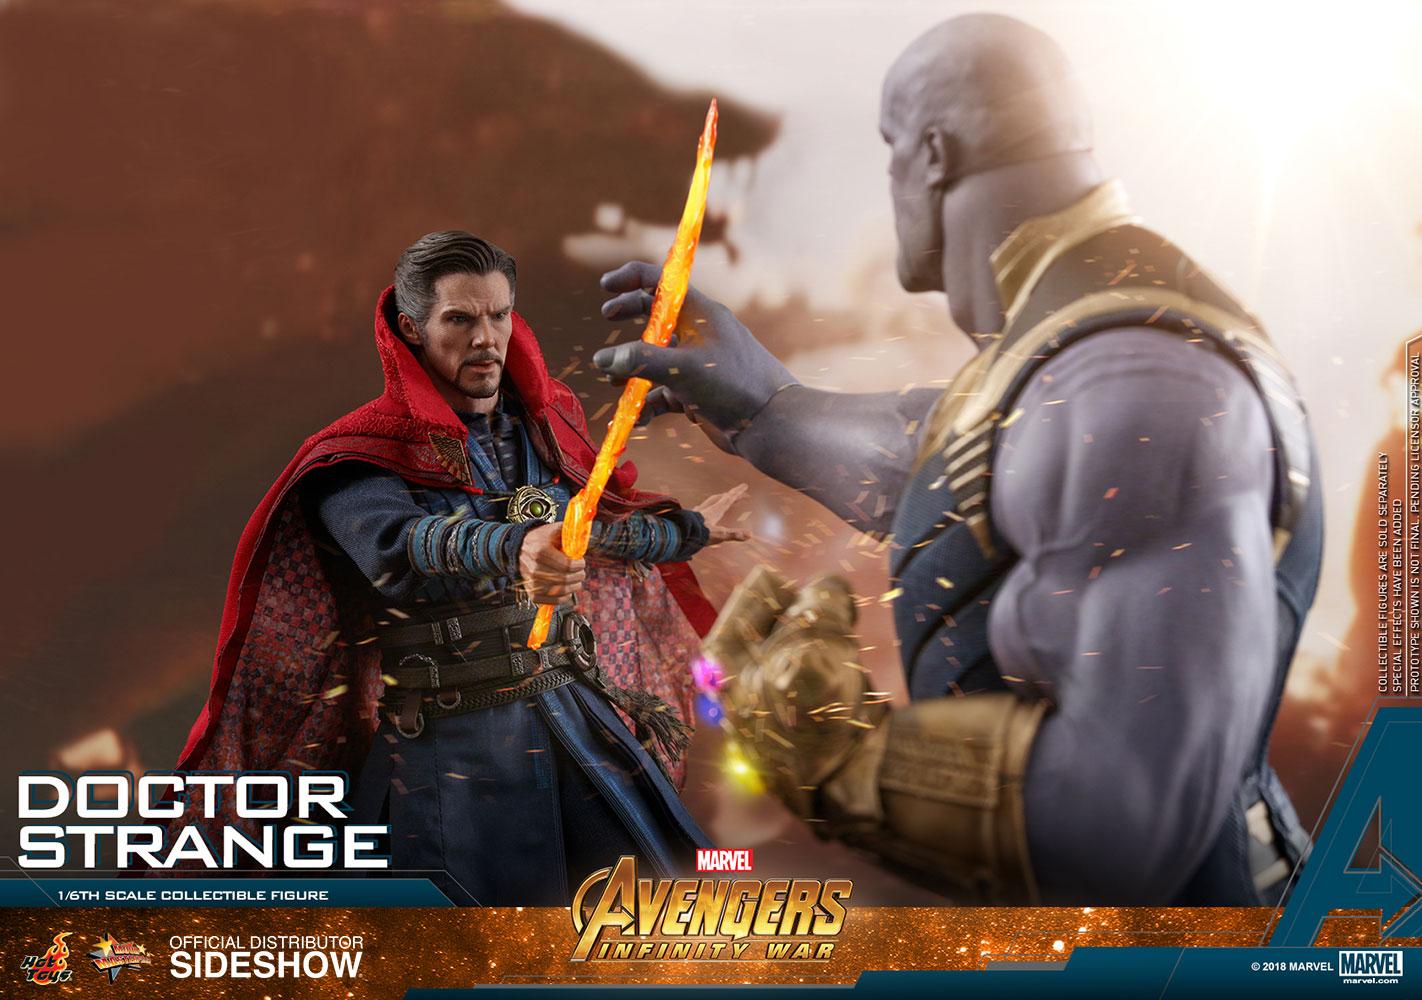 Doctor Strange - Prototype Shown